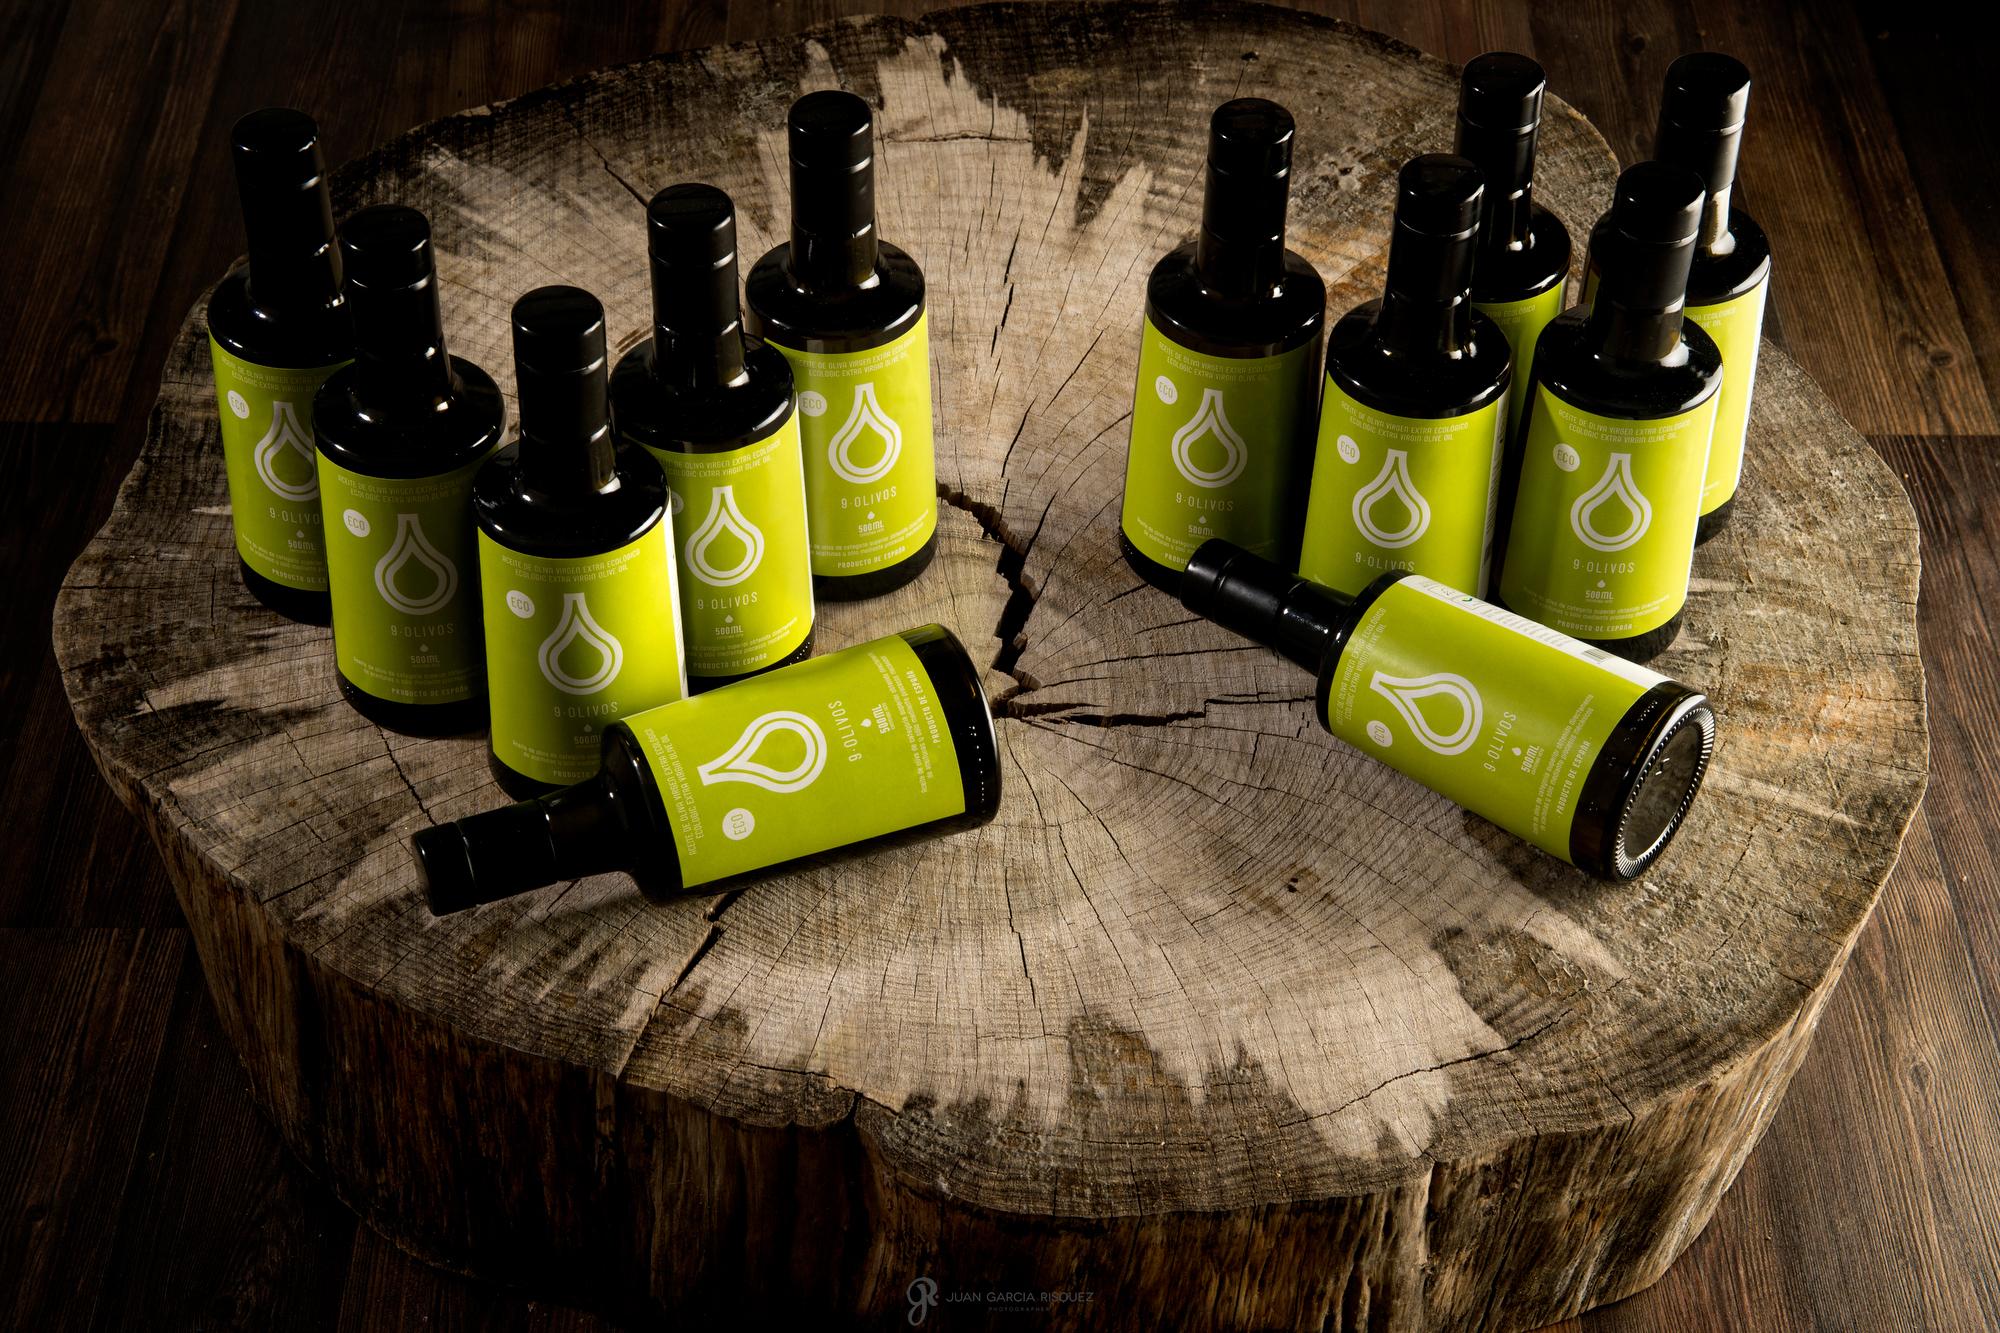 aceite de oliva 9 olivos en Jaen